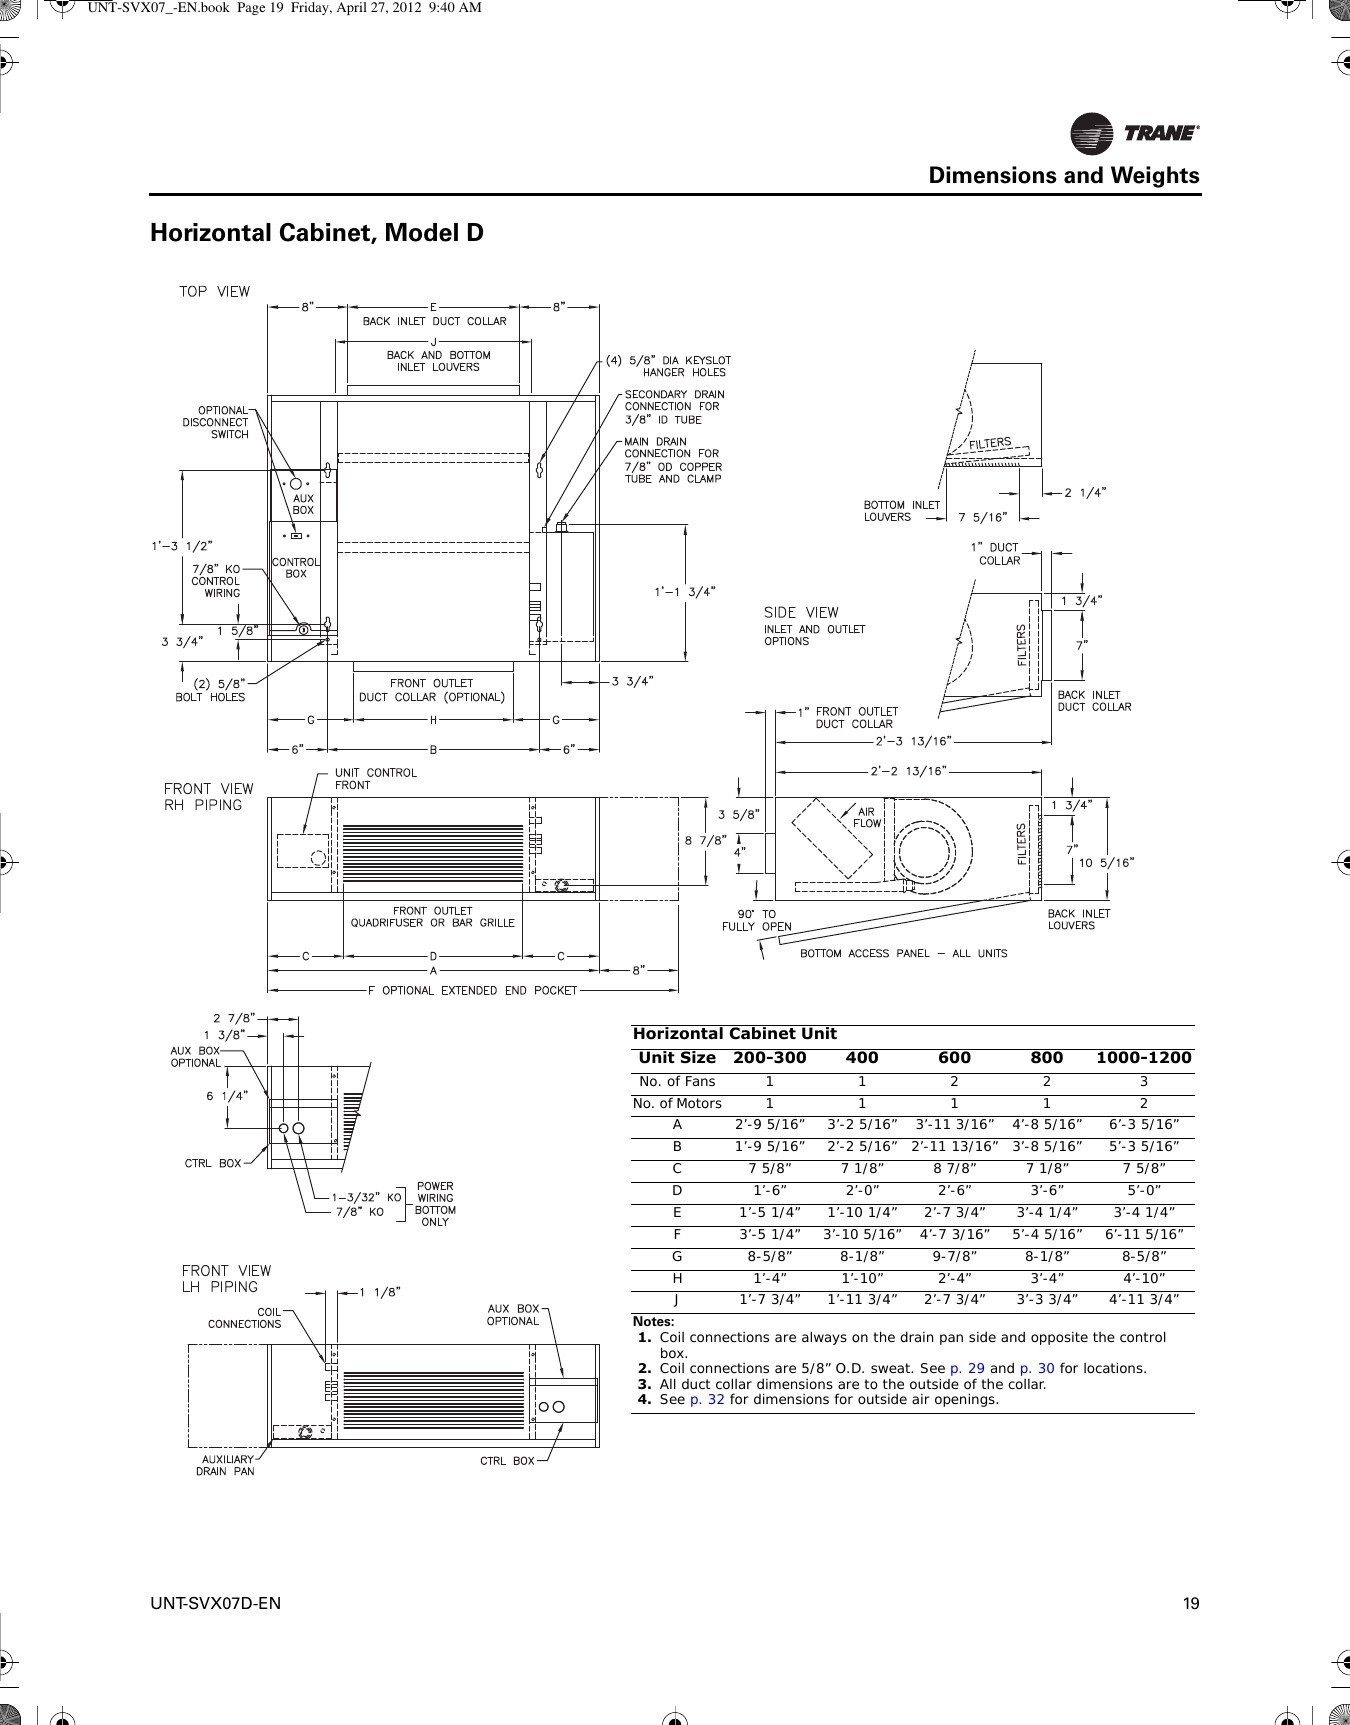 trane parts diagram